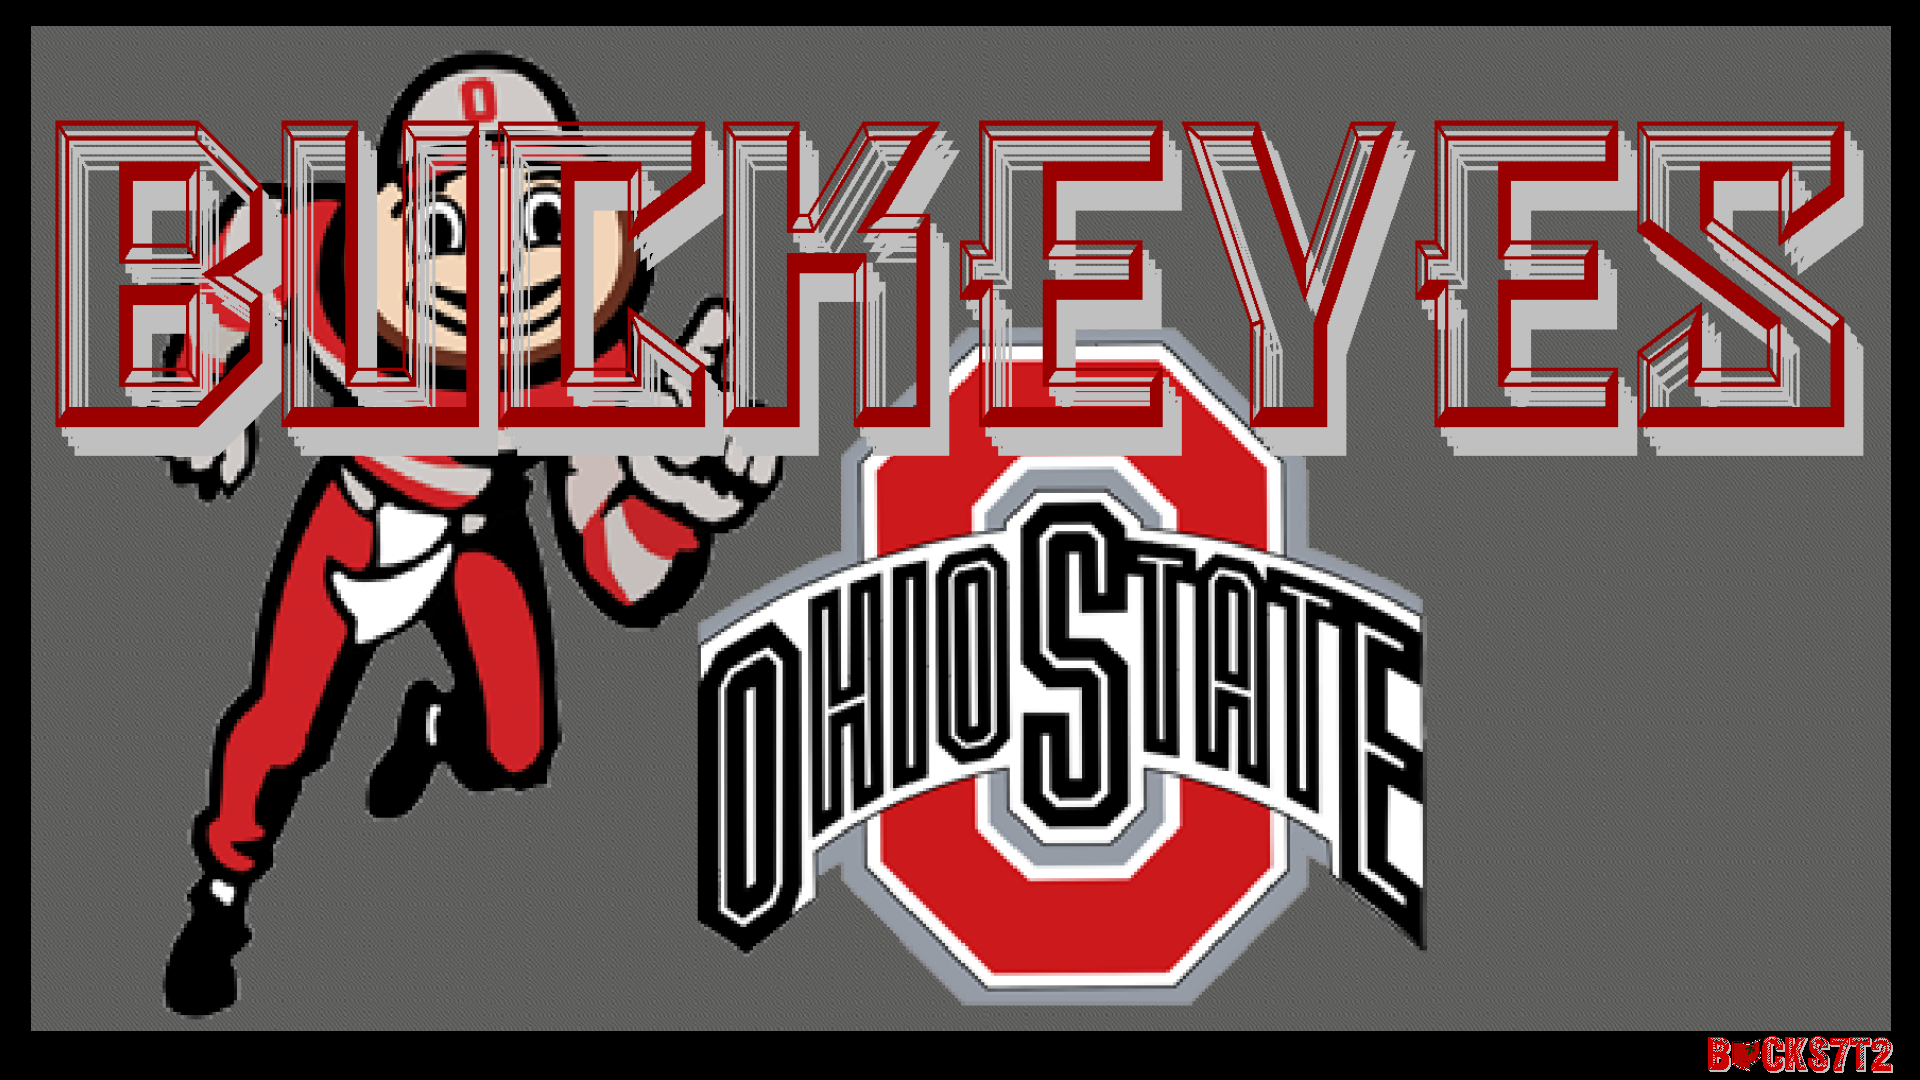 Ohio state university brutus buckeye statue - Ohio State Buckeyes Brutus Buckeye Hd Wallpaper And Background Photos